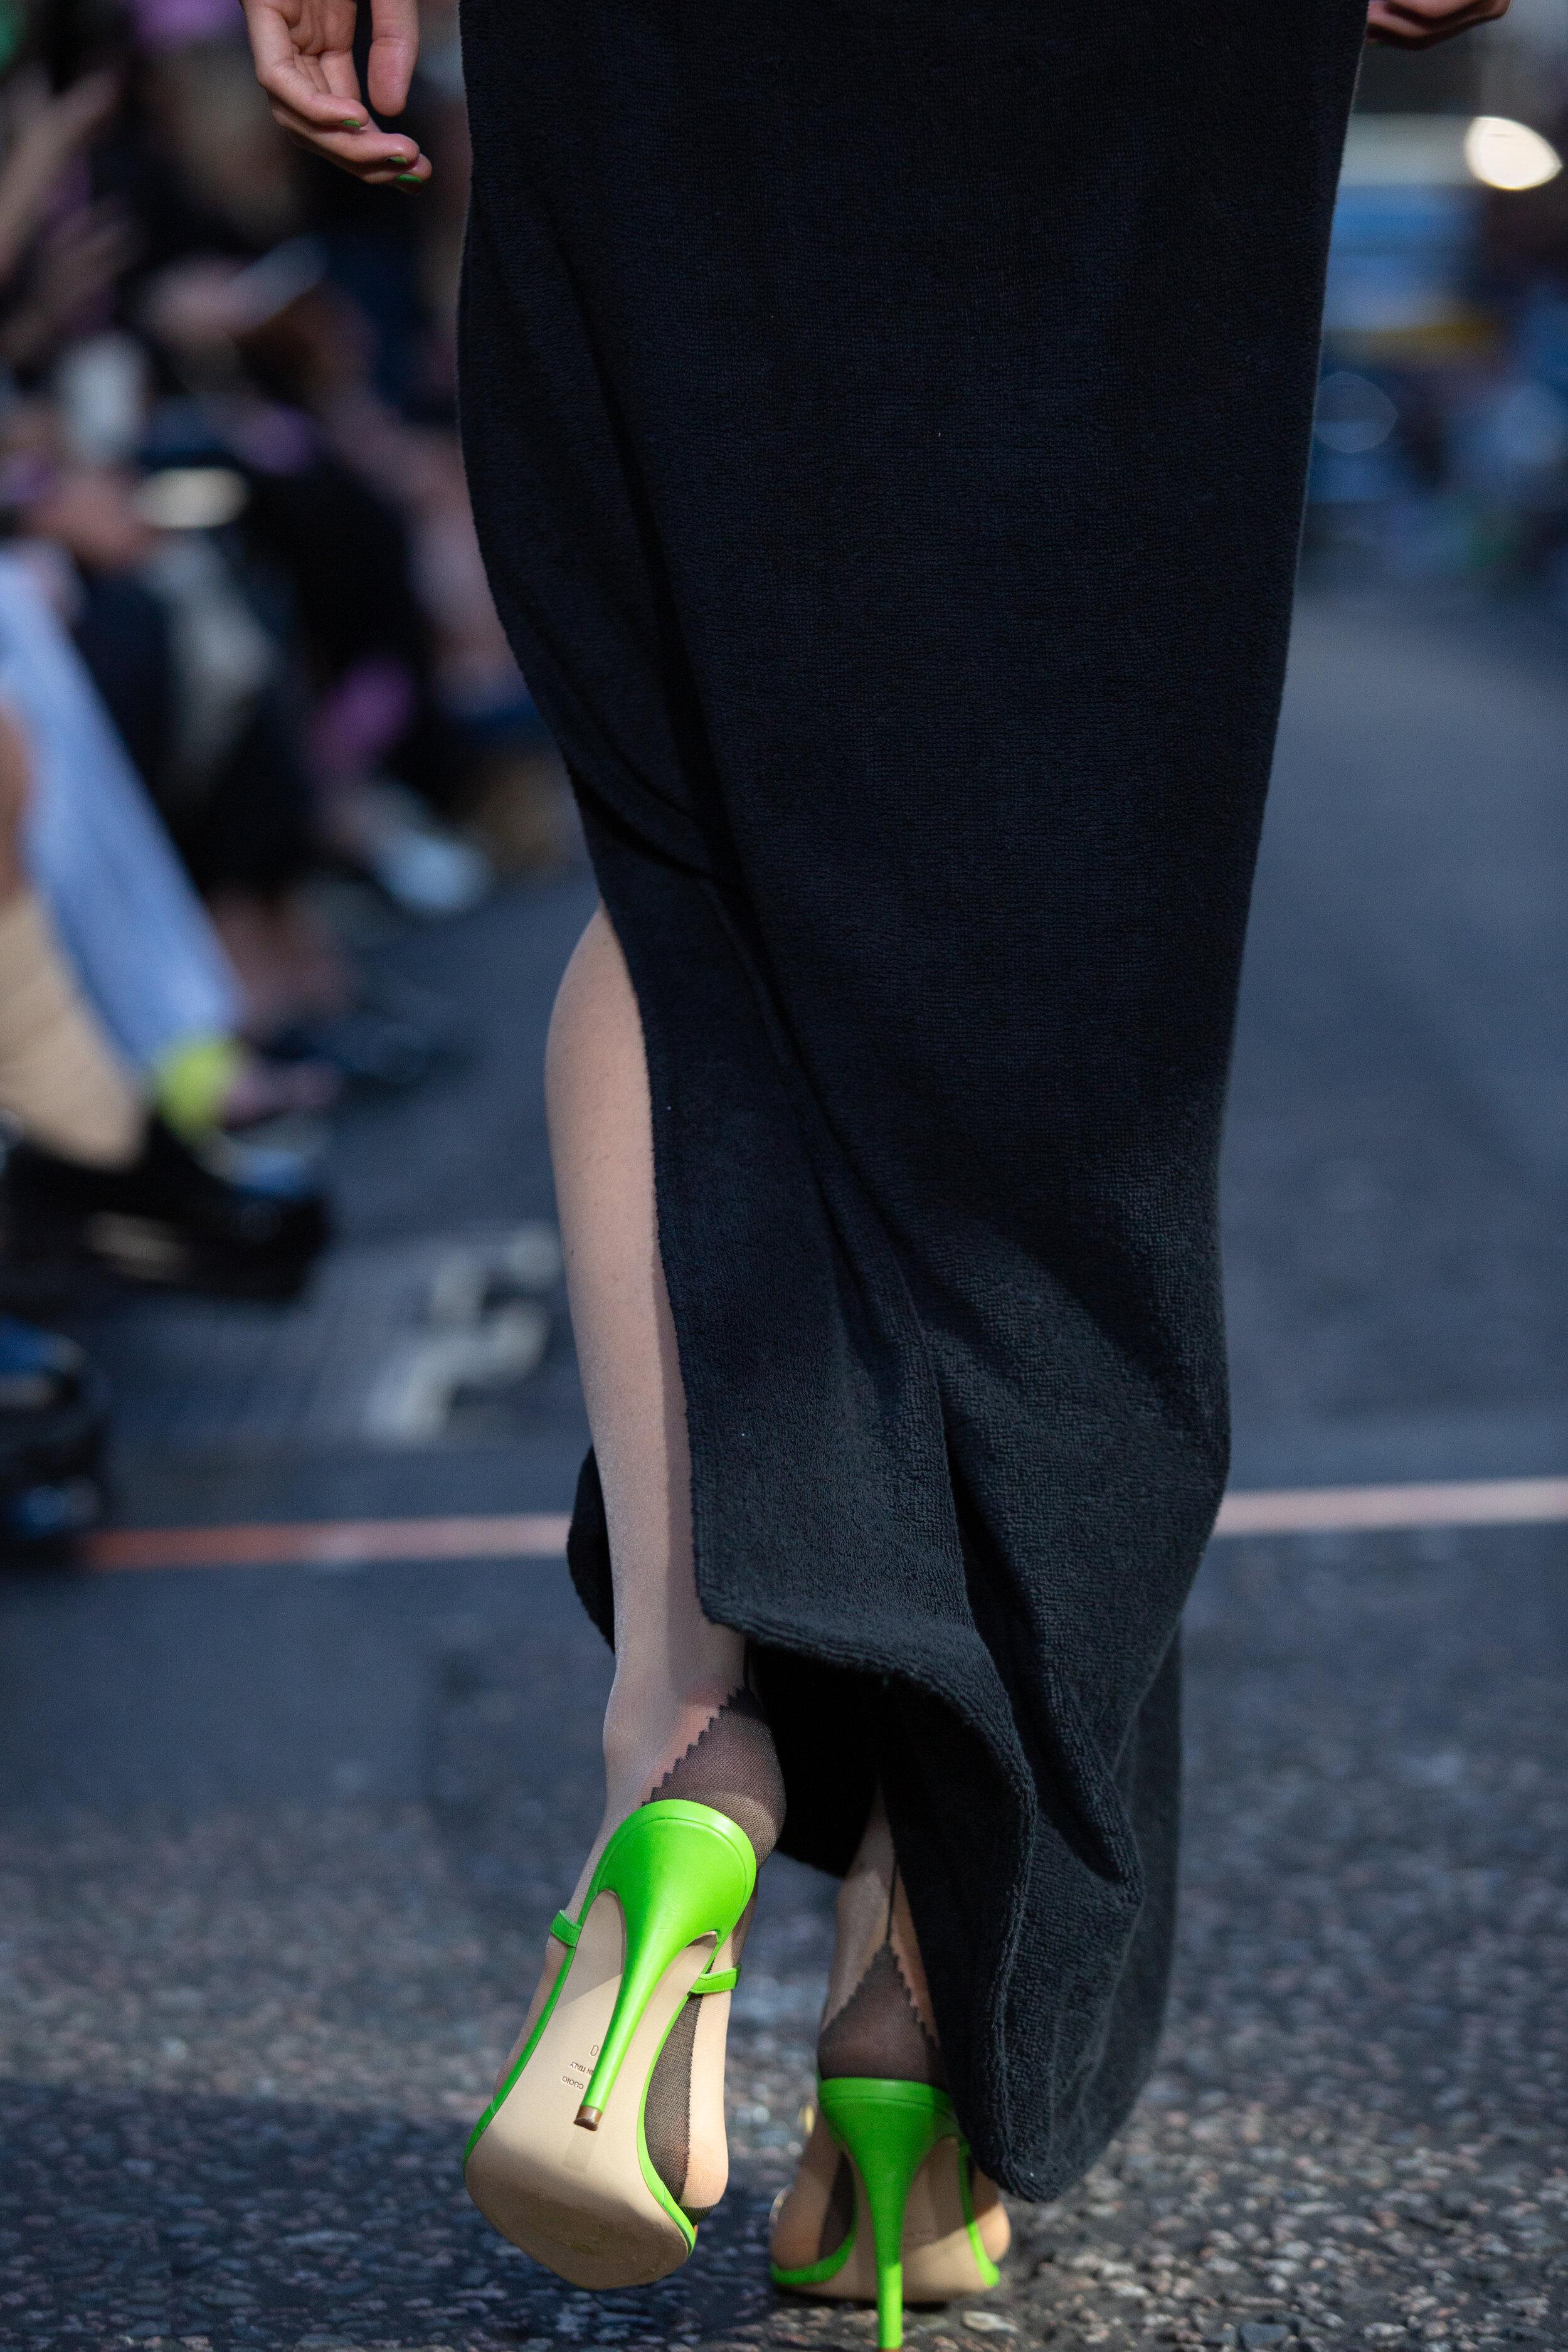 A model on the catwalk at the Natasha Zinko X DUO catwalk show